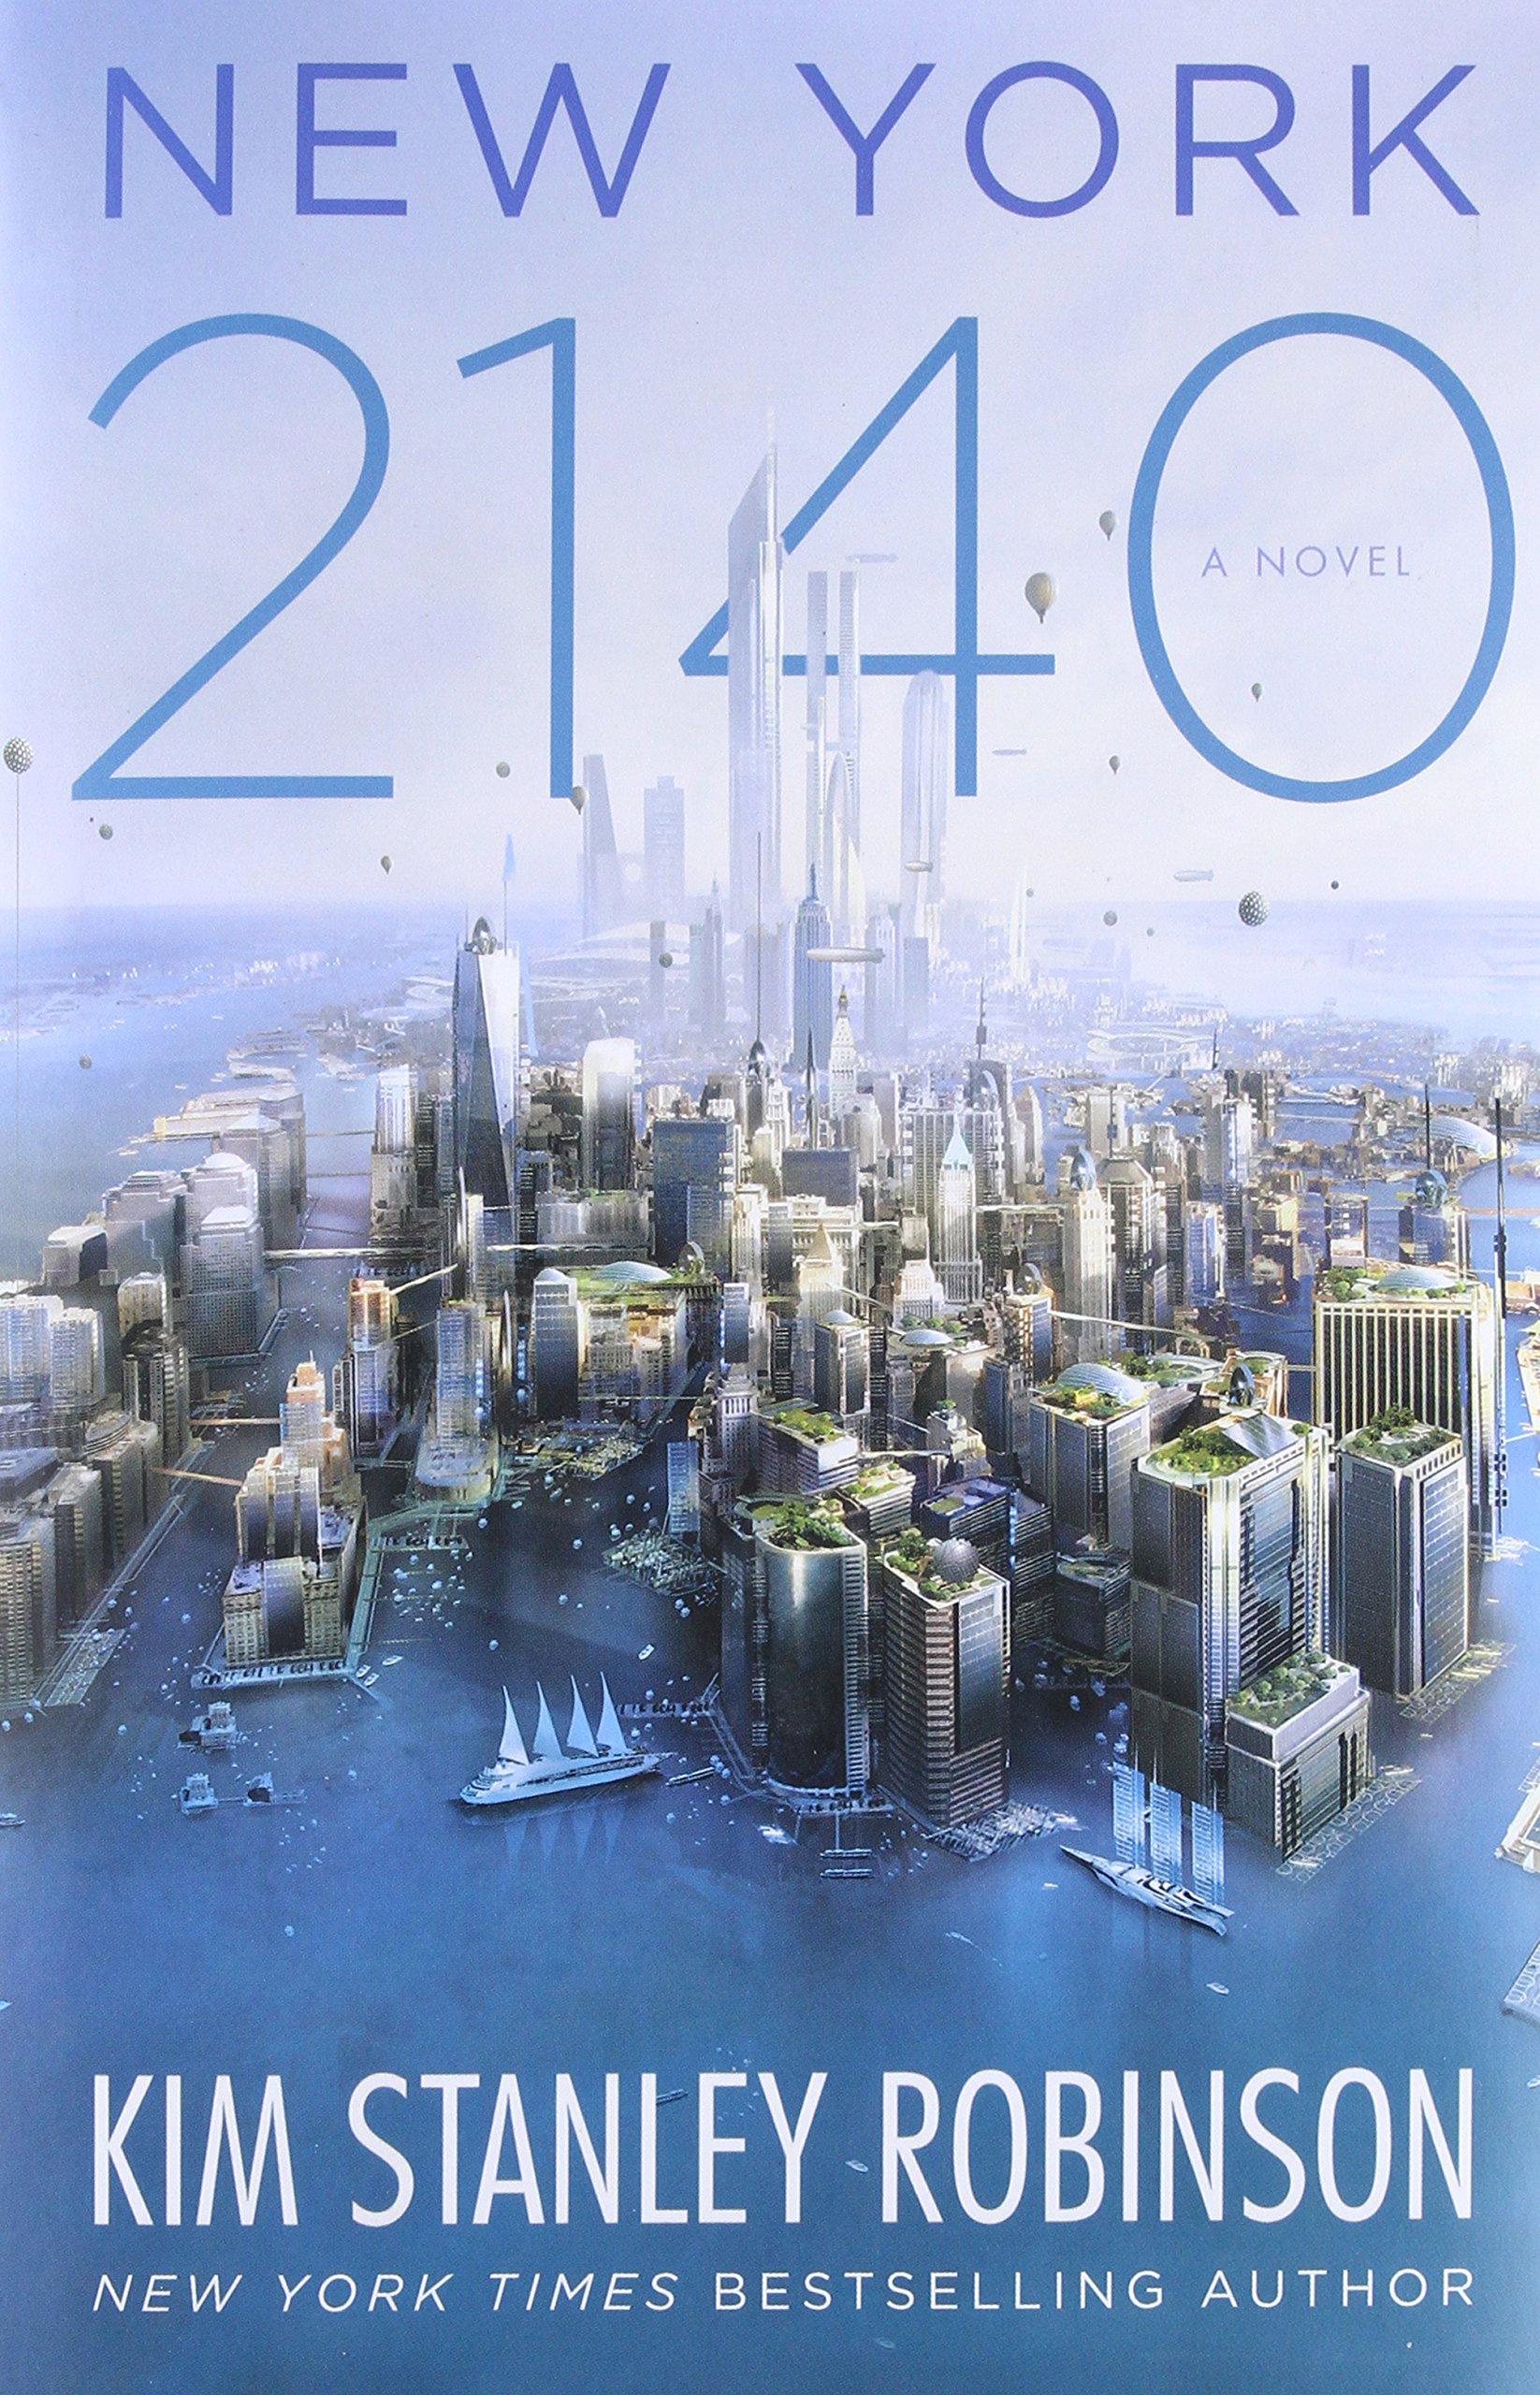 New York 2140: Robinson, Kim Stanley: 9780316262347: Books - Amazon.ca